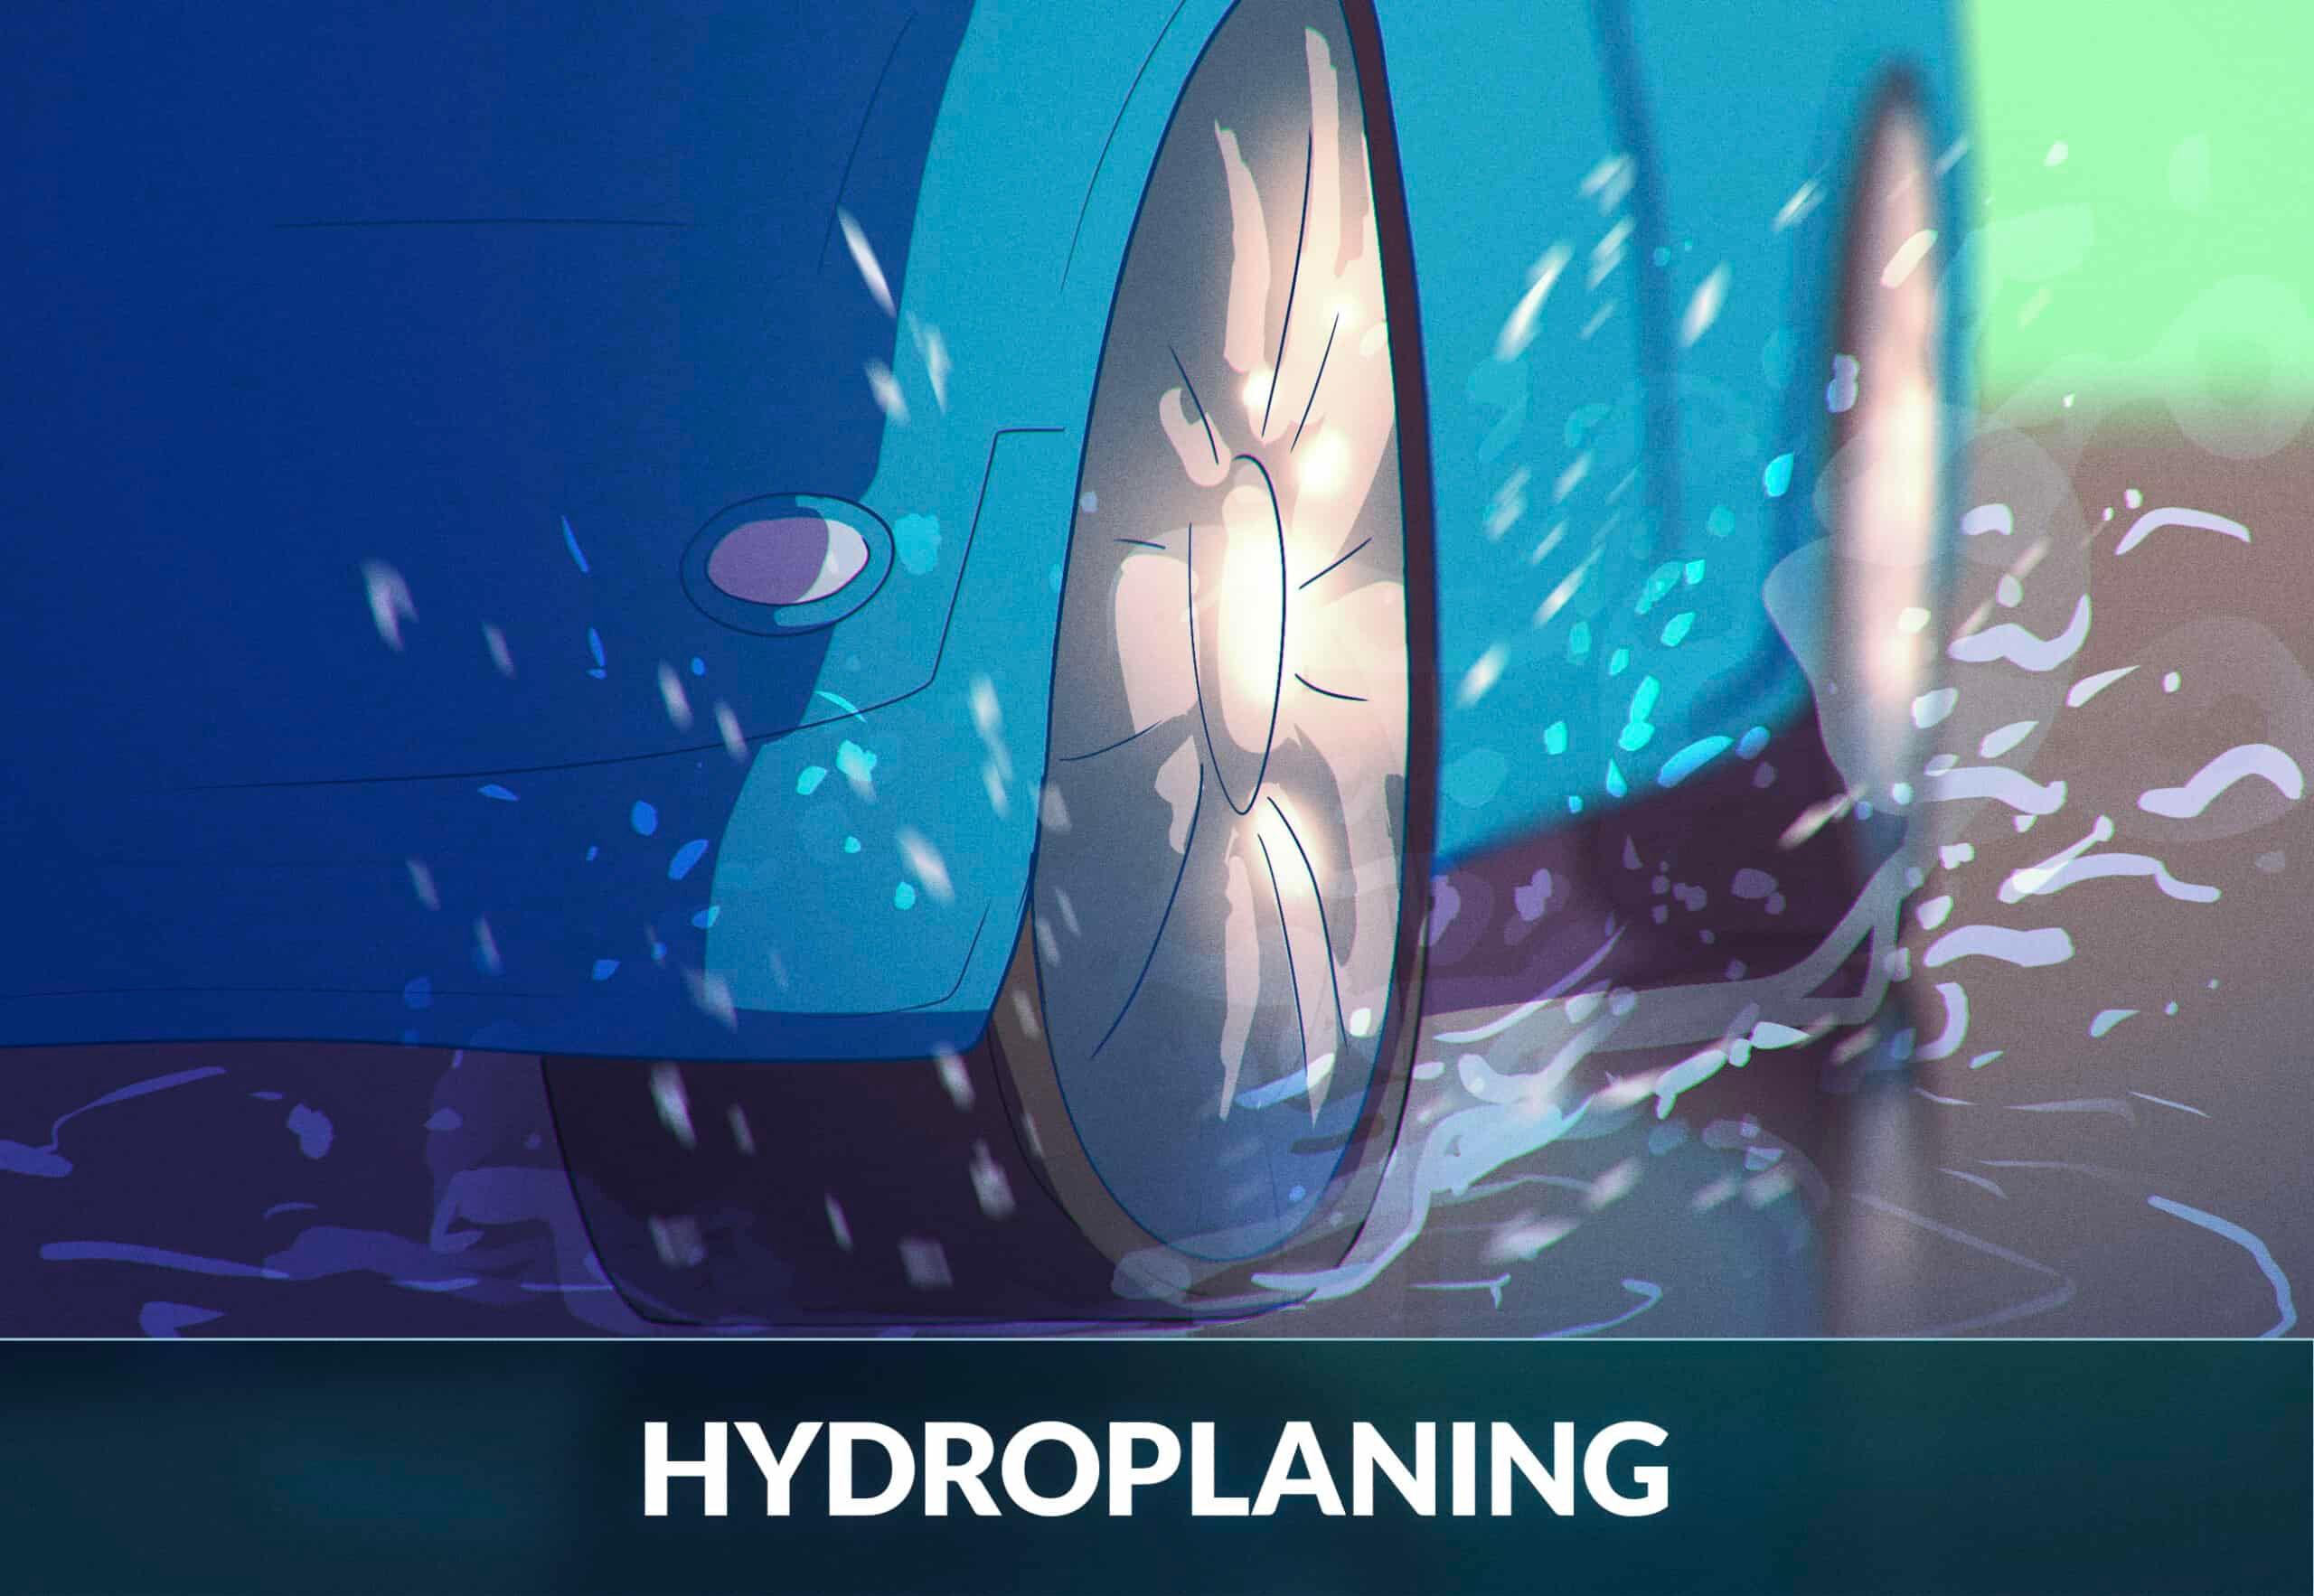 Hydroplaning